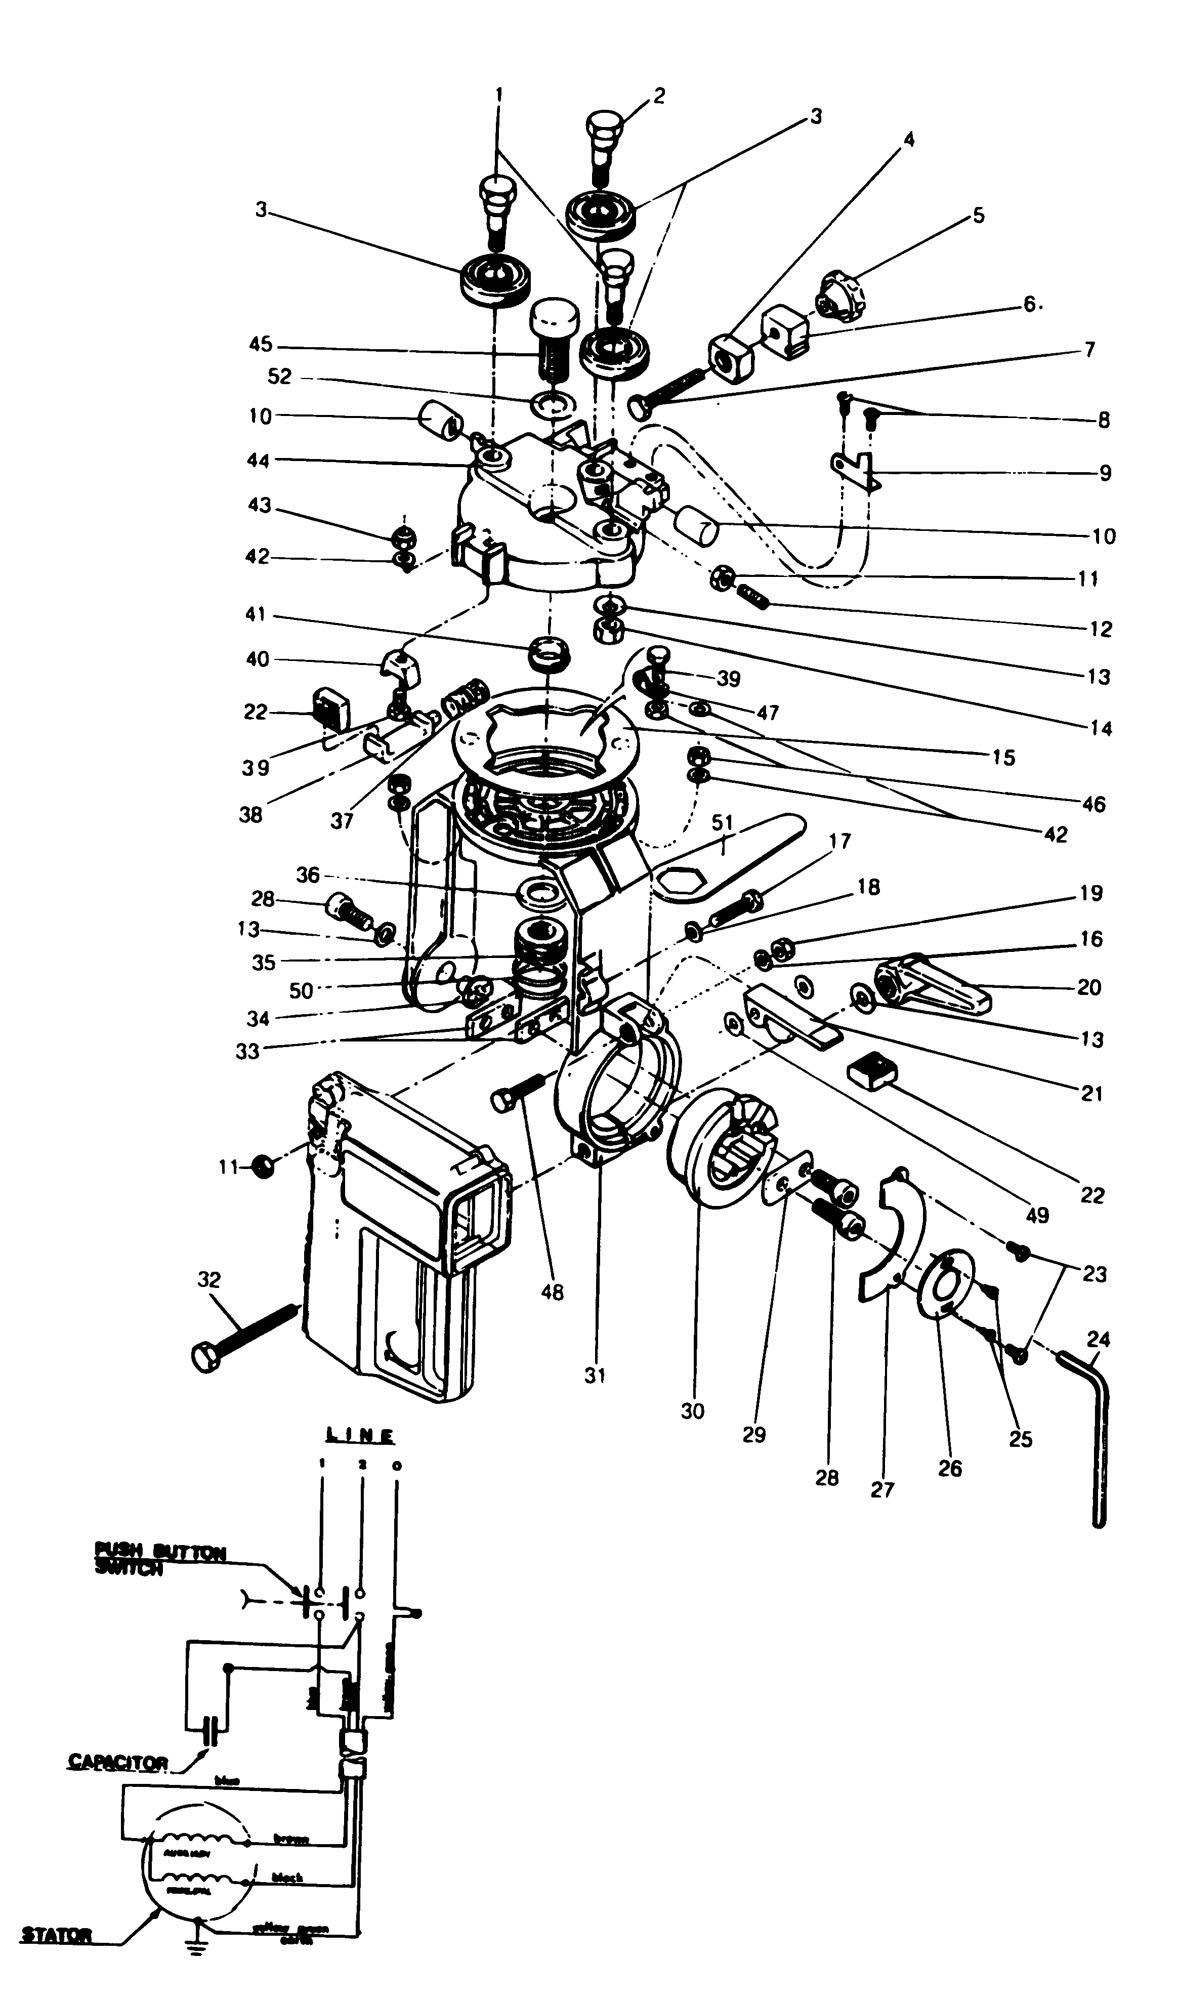 Spares For Dewalt Dn890 C Radial Arm Saw Type 1